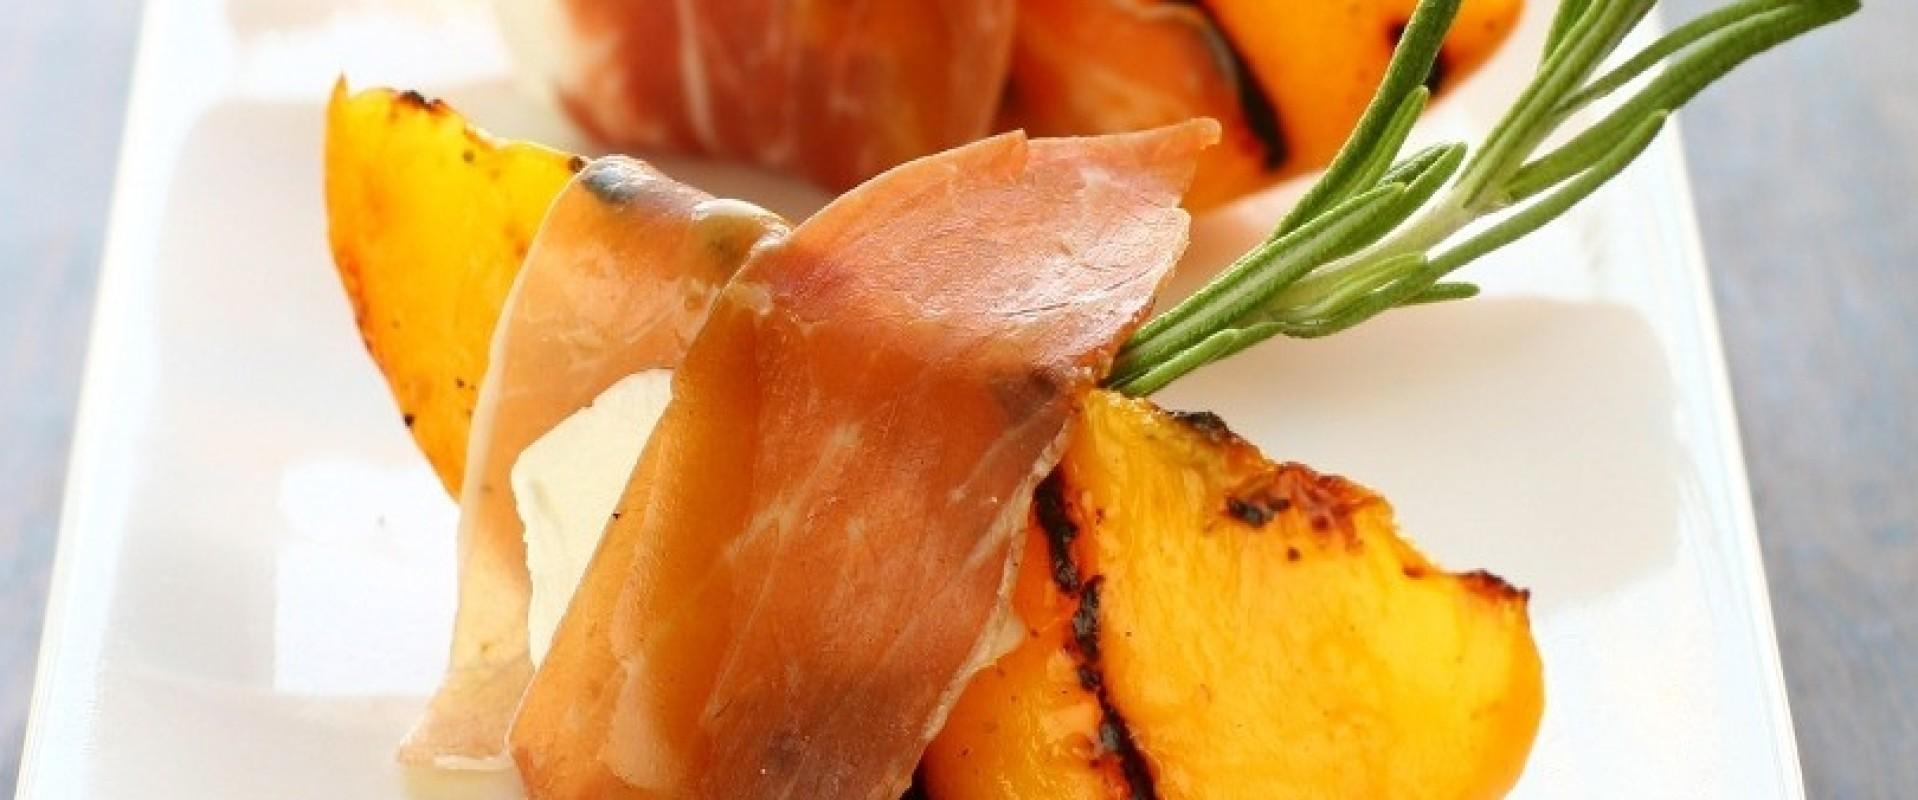 Serrano ham met gemarineerde perzik